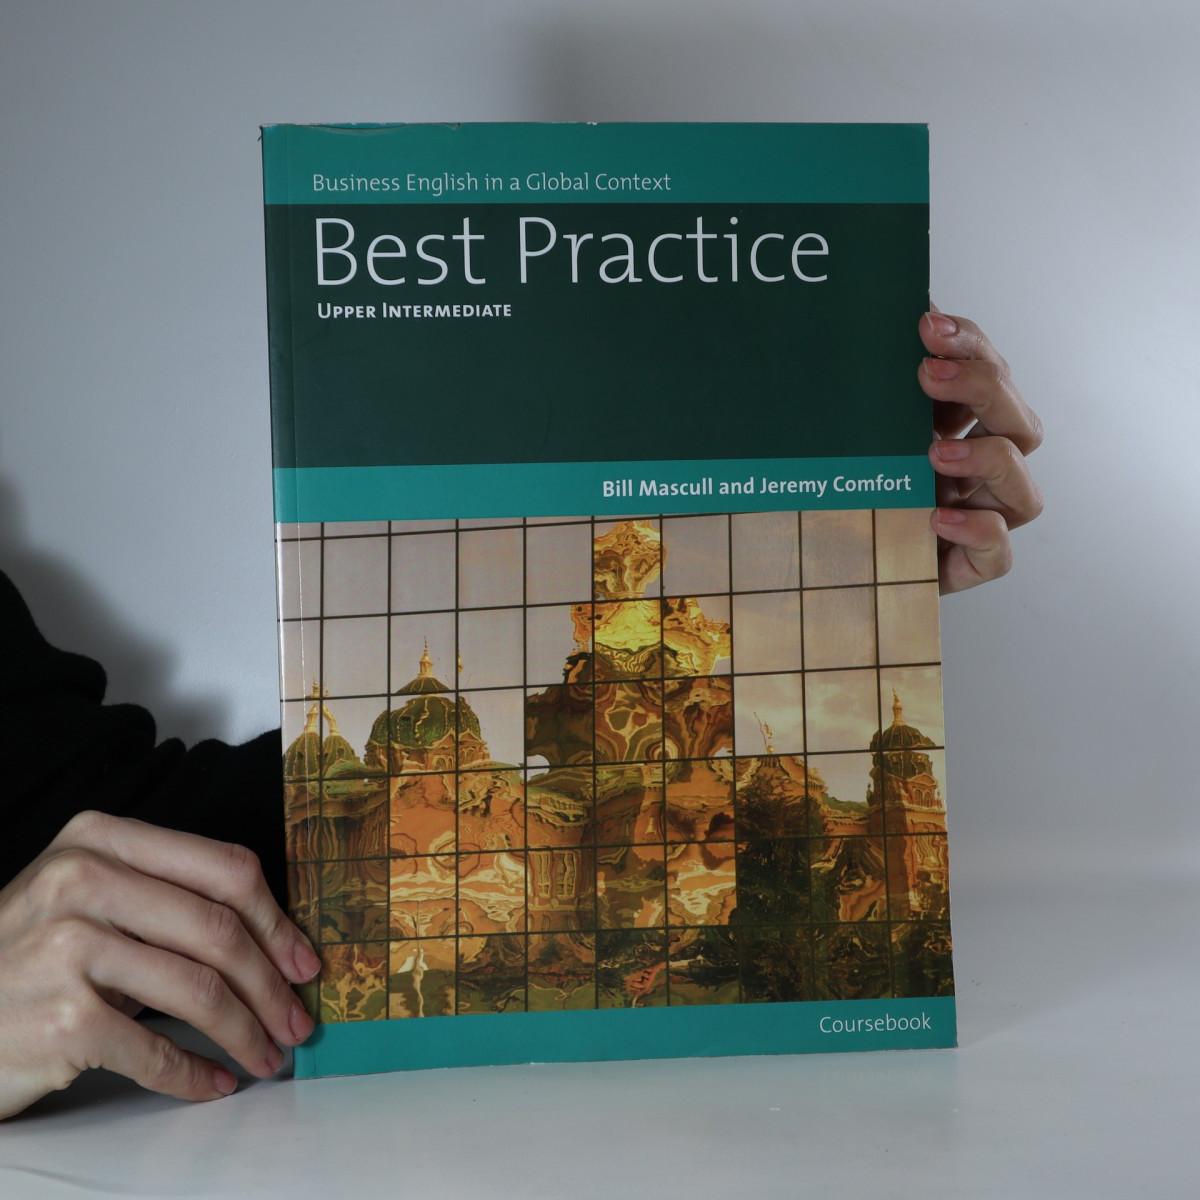 antikvární kniha Best practice. Coursebook : best practice in a global context : upper intermediate, 2008